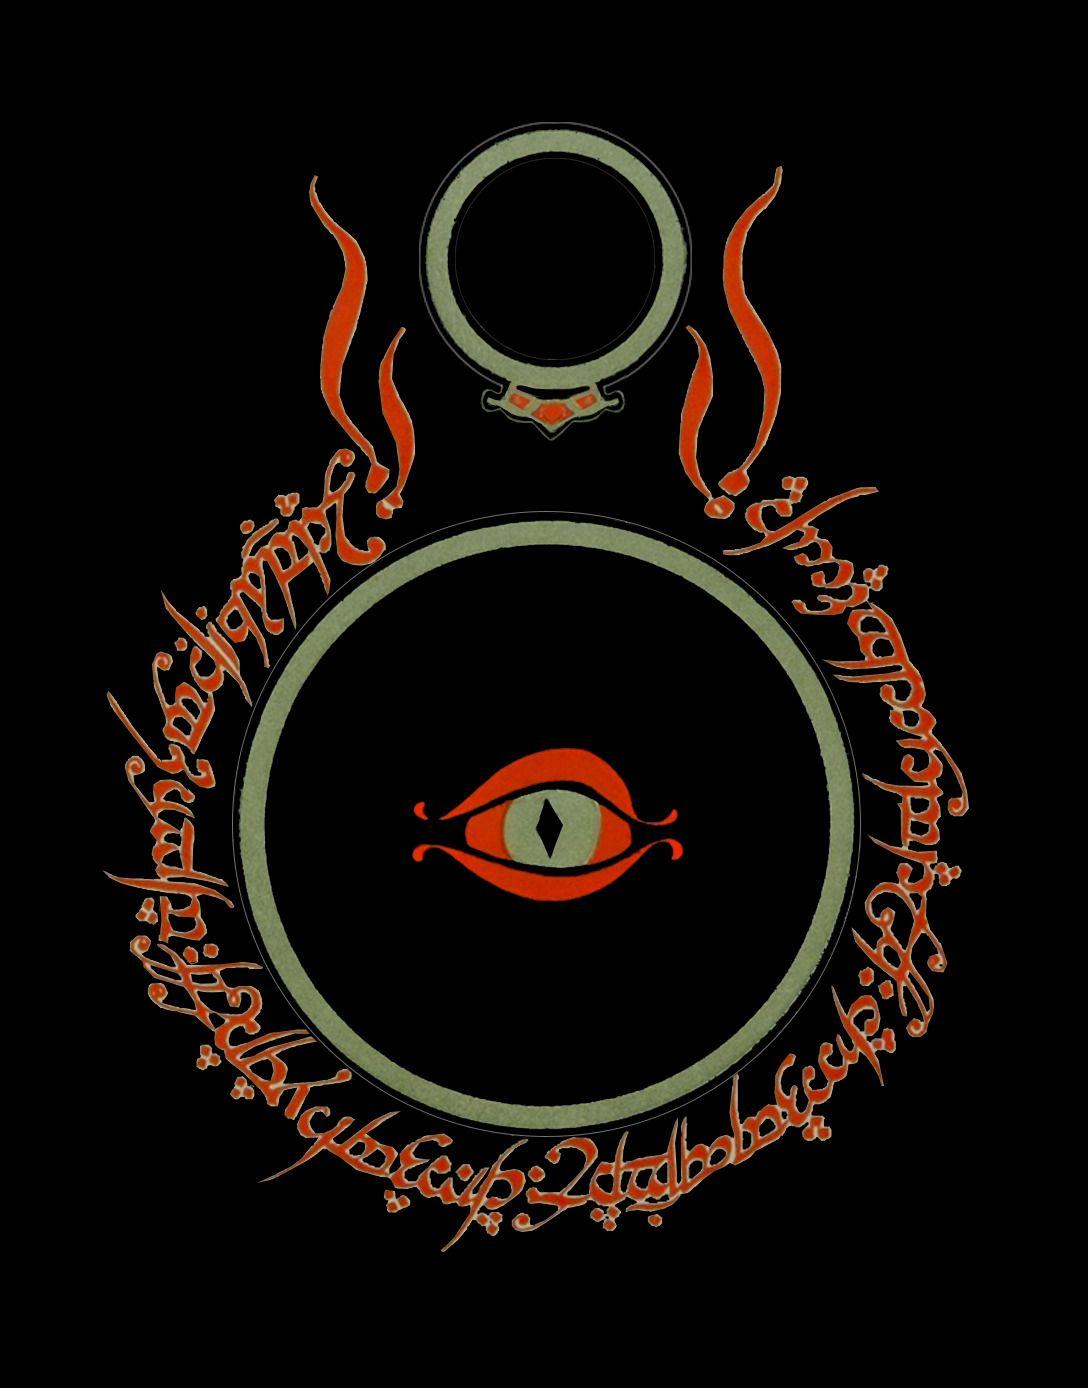 Illustration by J.R.R. Tolkien